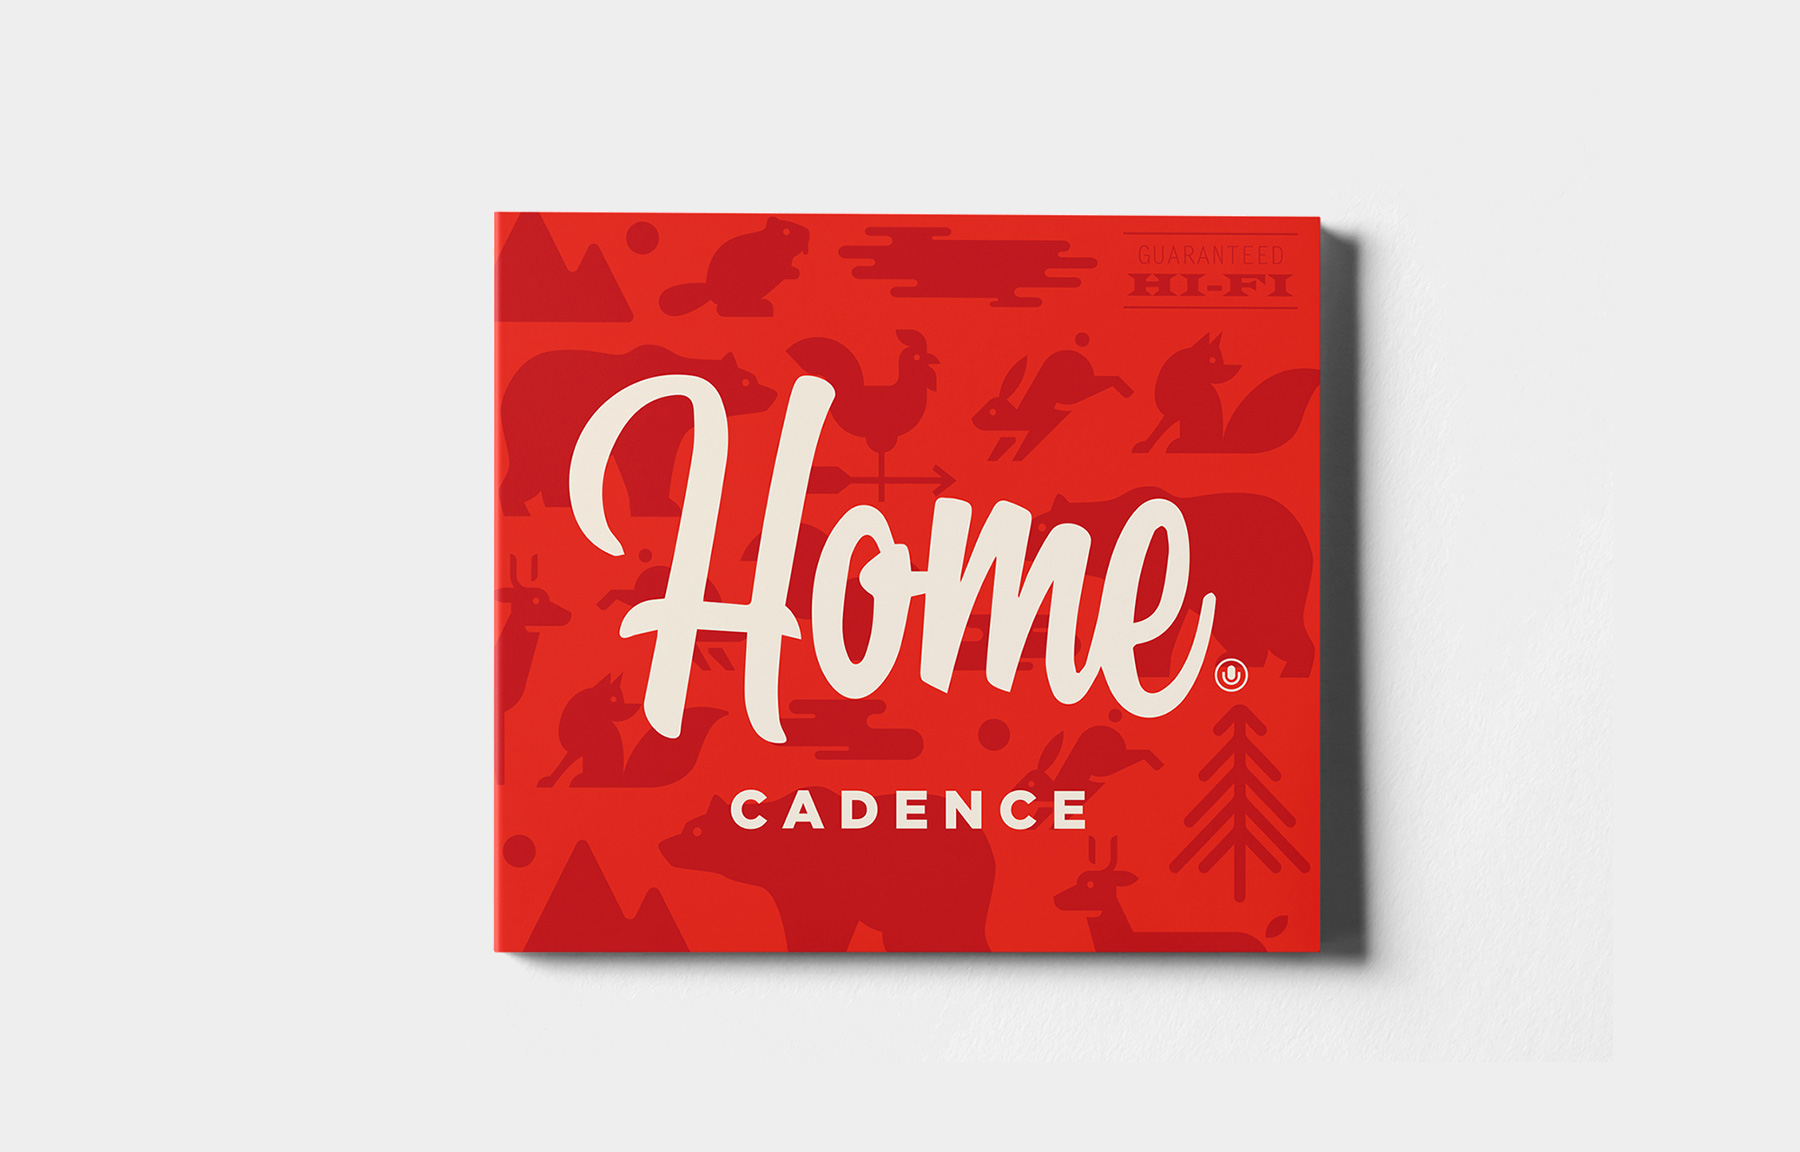 Cadence-CD.jpg